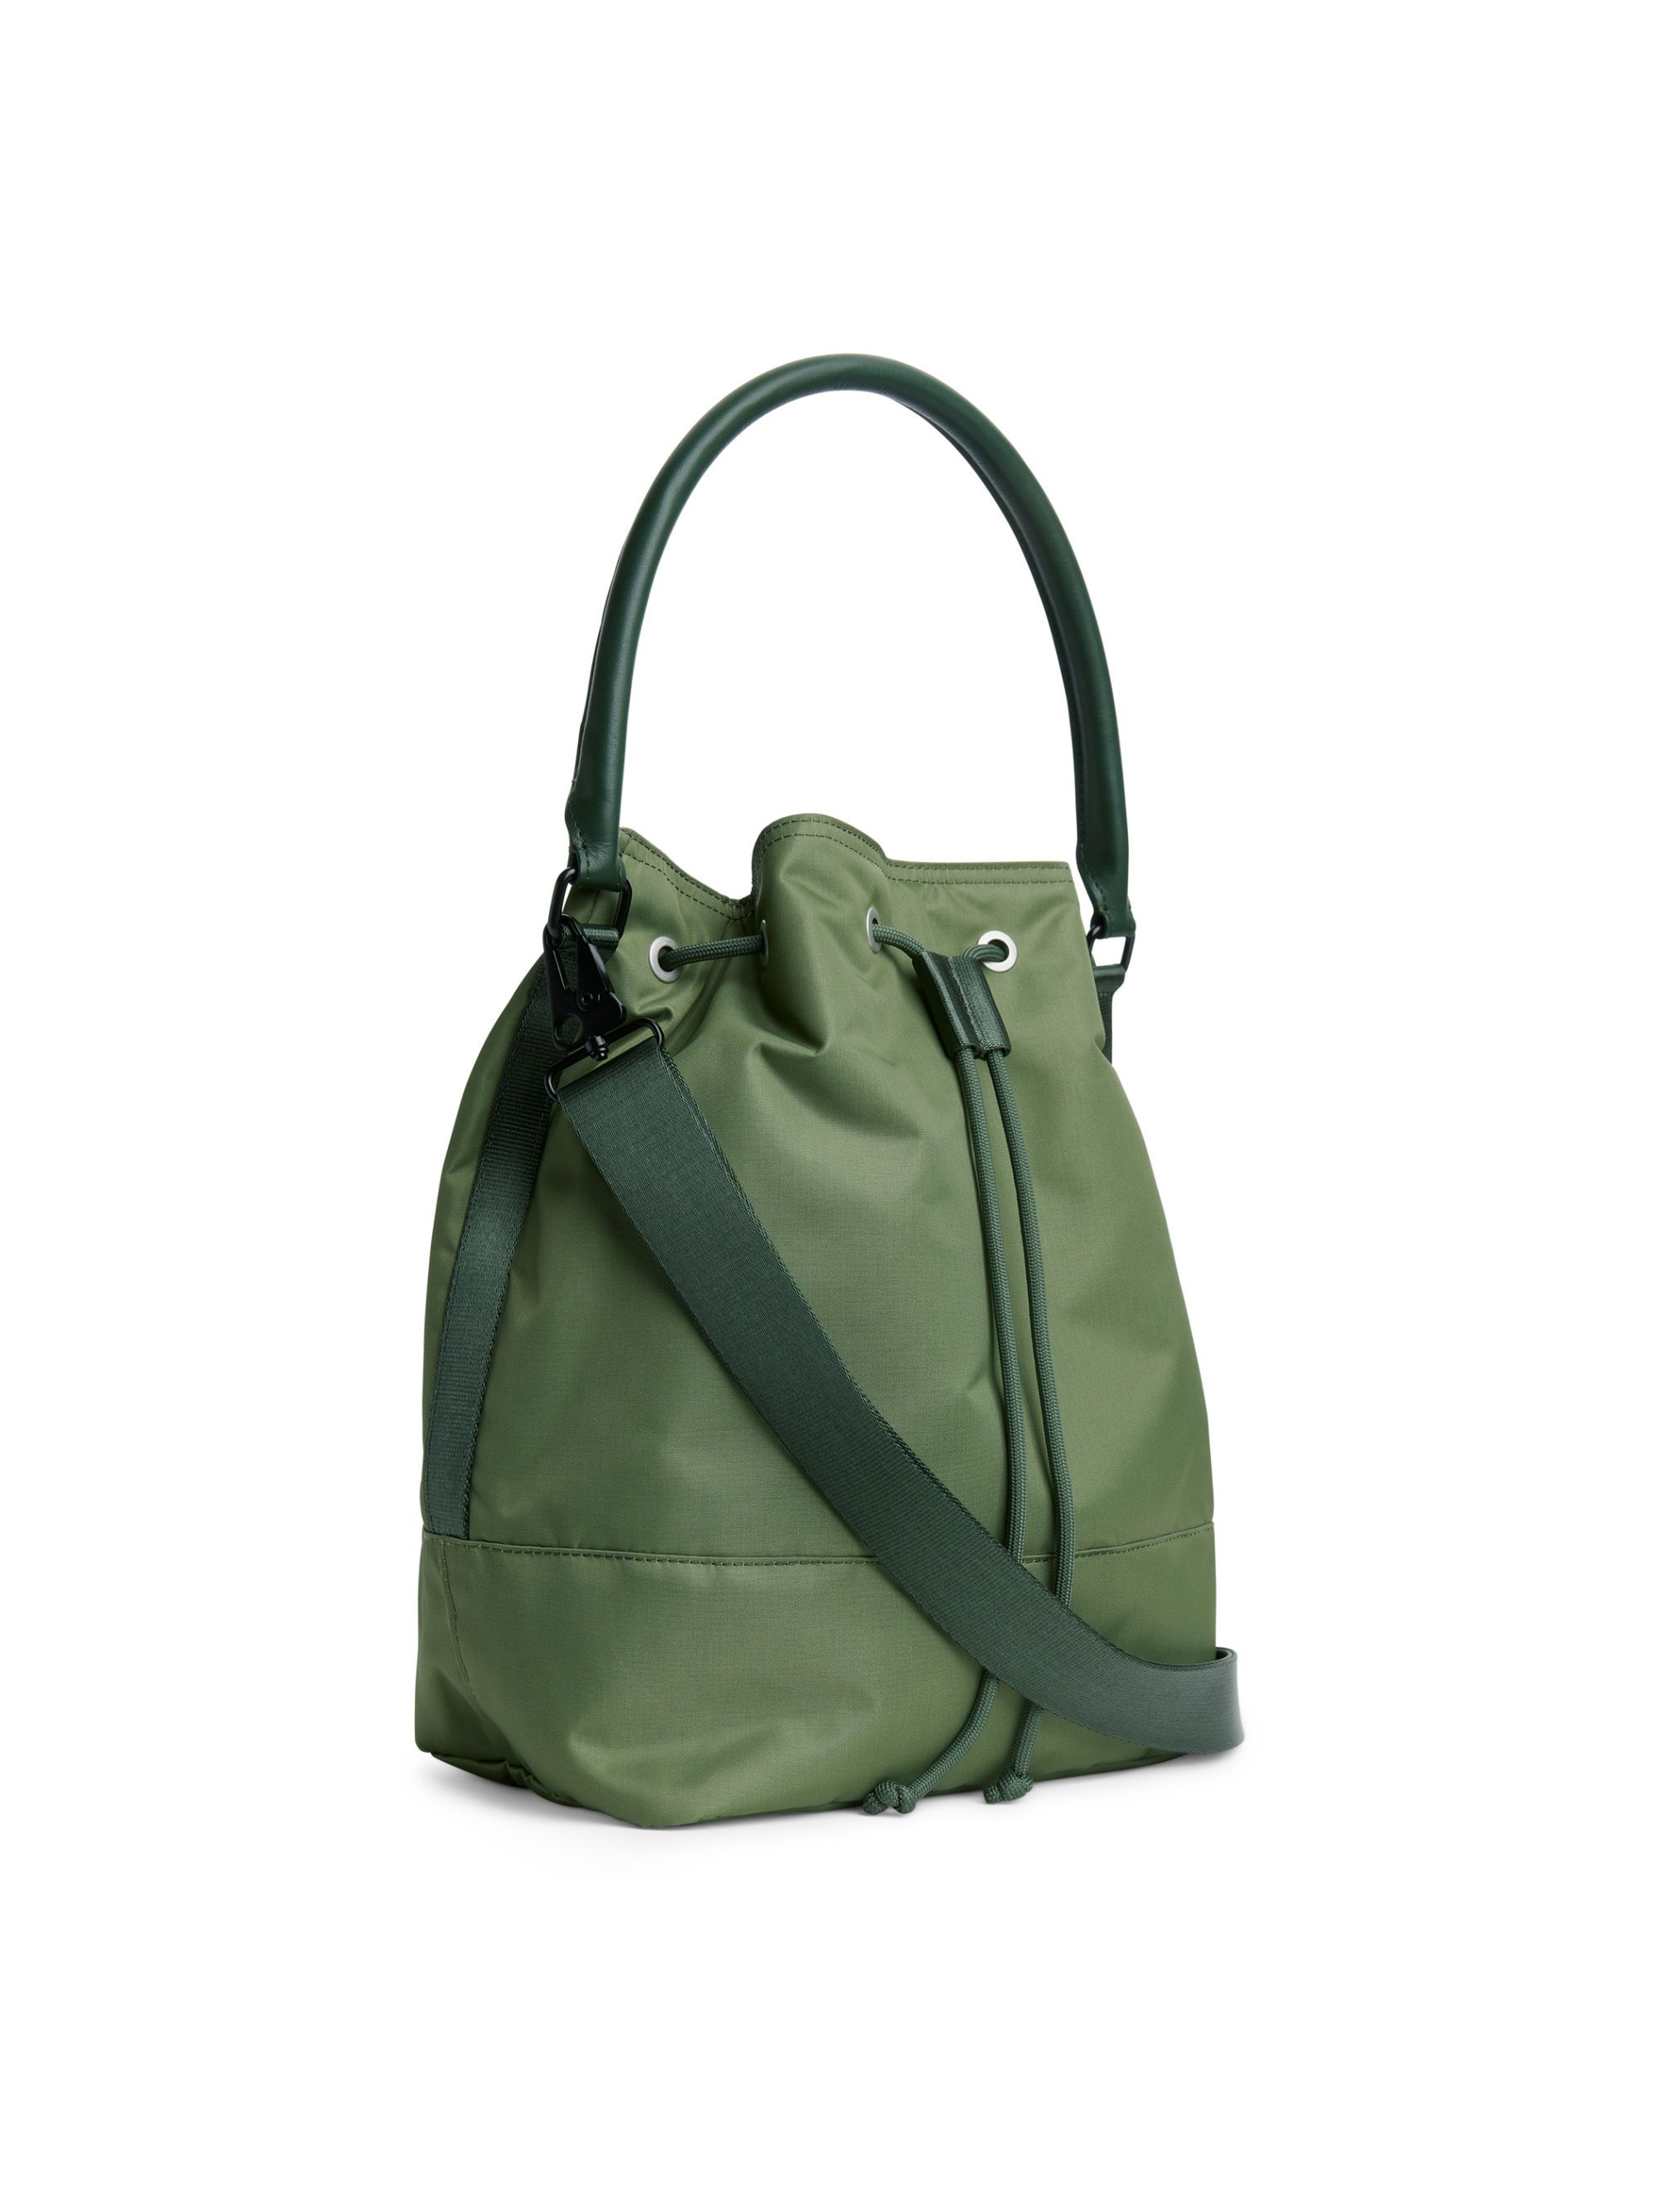 Nylon Bucket Bag - Khaki Green - Bags   accessories - ARKET SE ... 70df692b73ca5